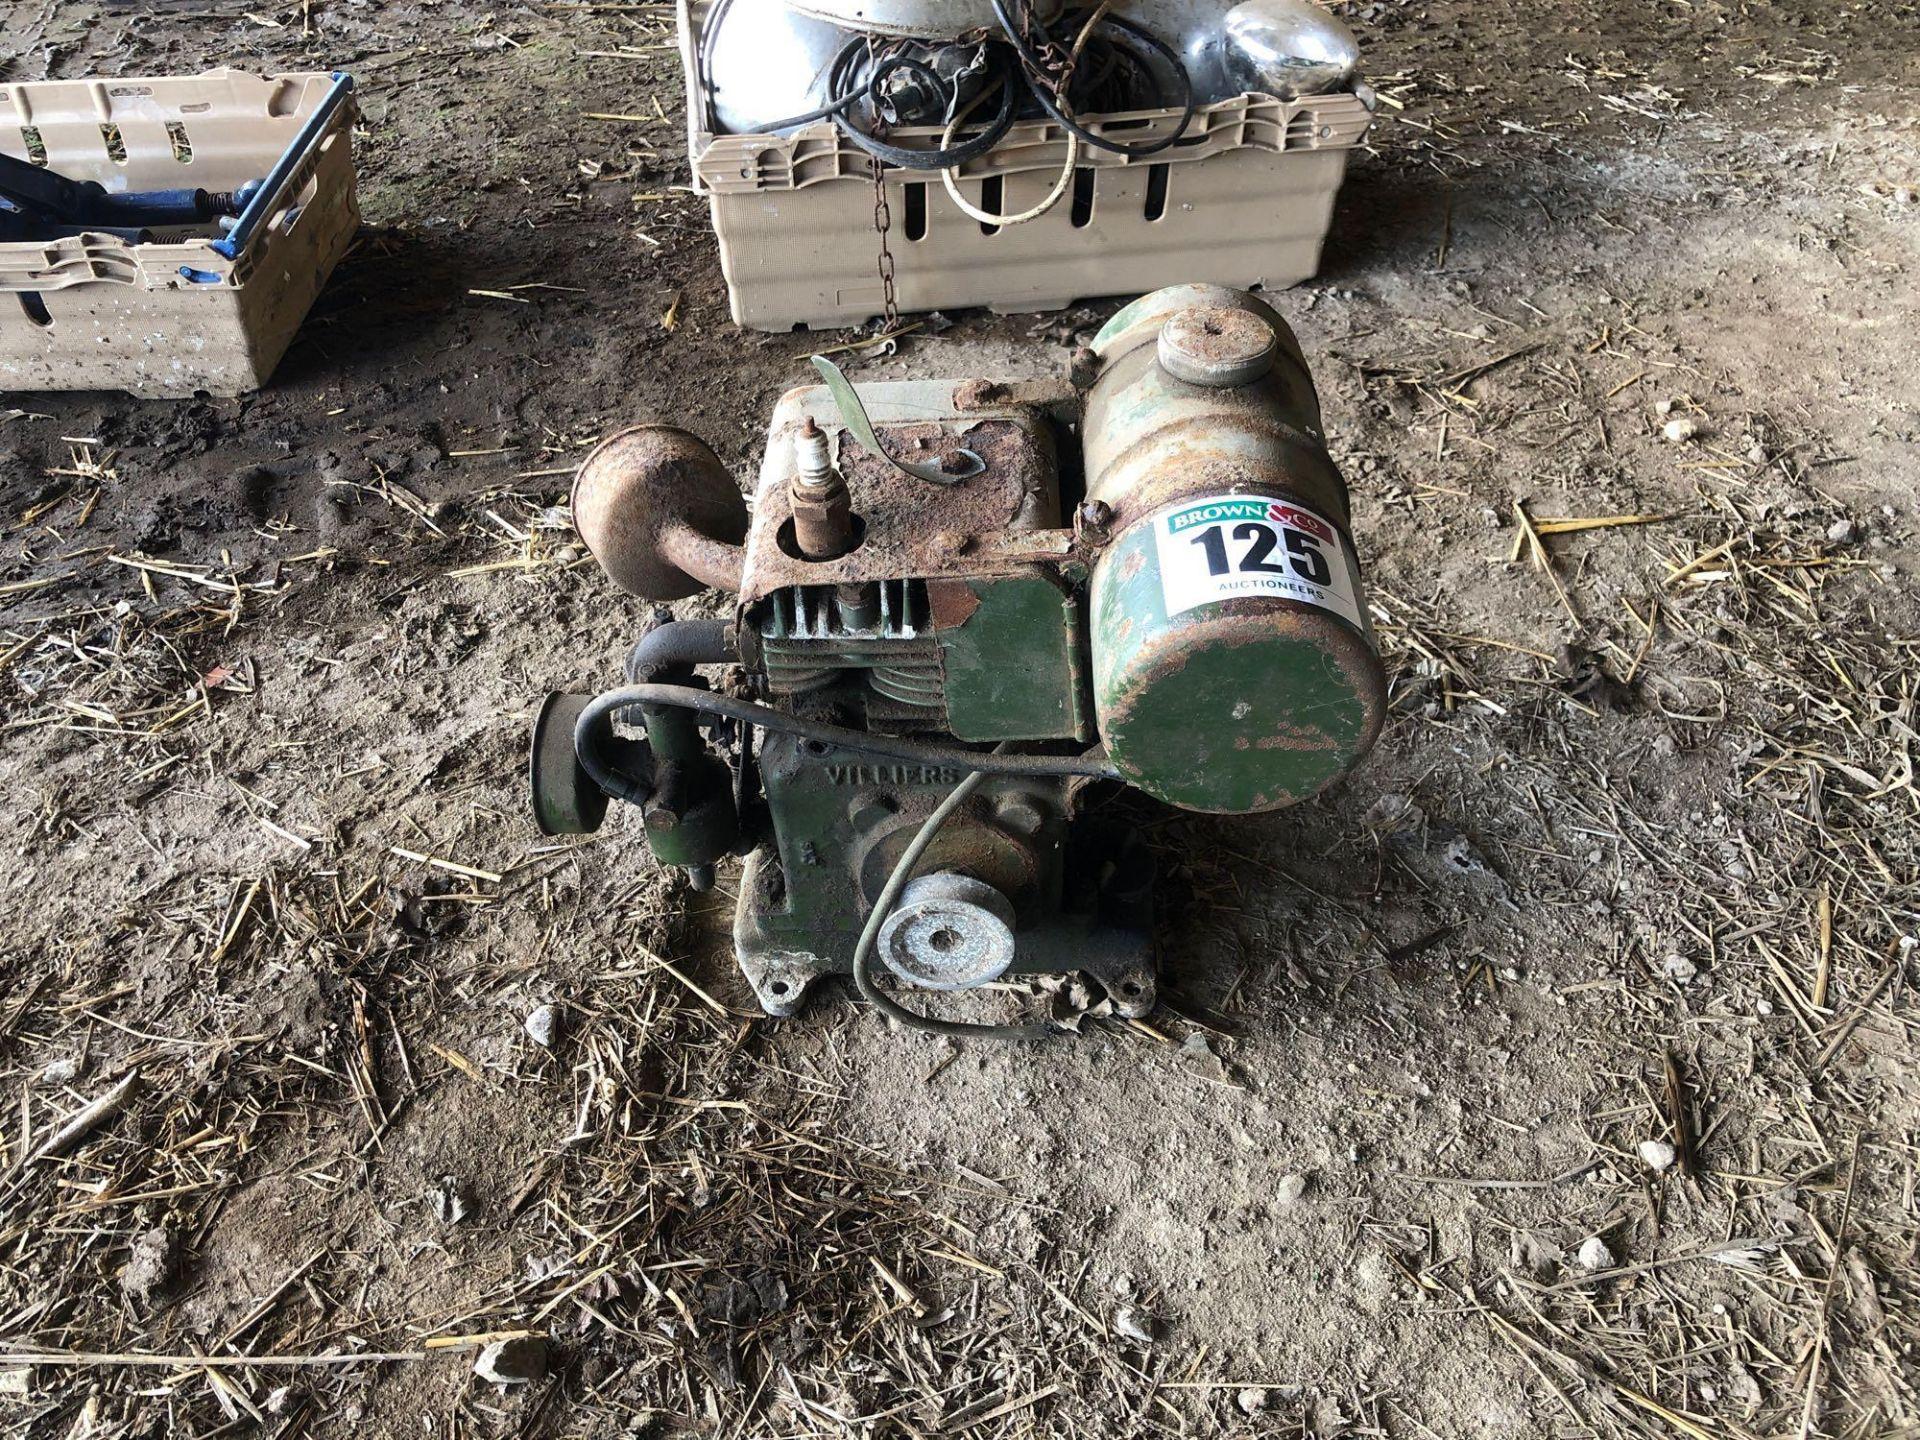 Lot 125 - Villers petrol engine